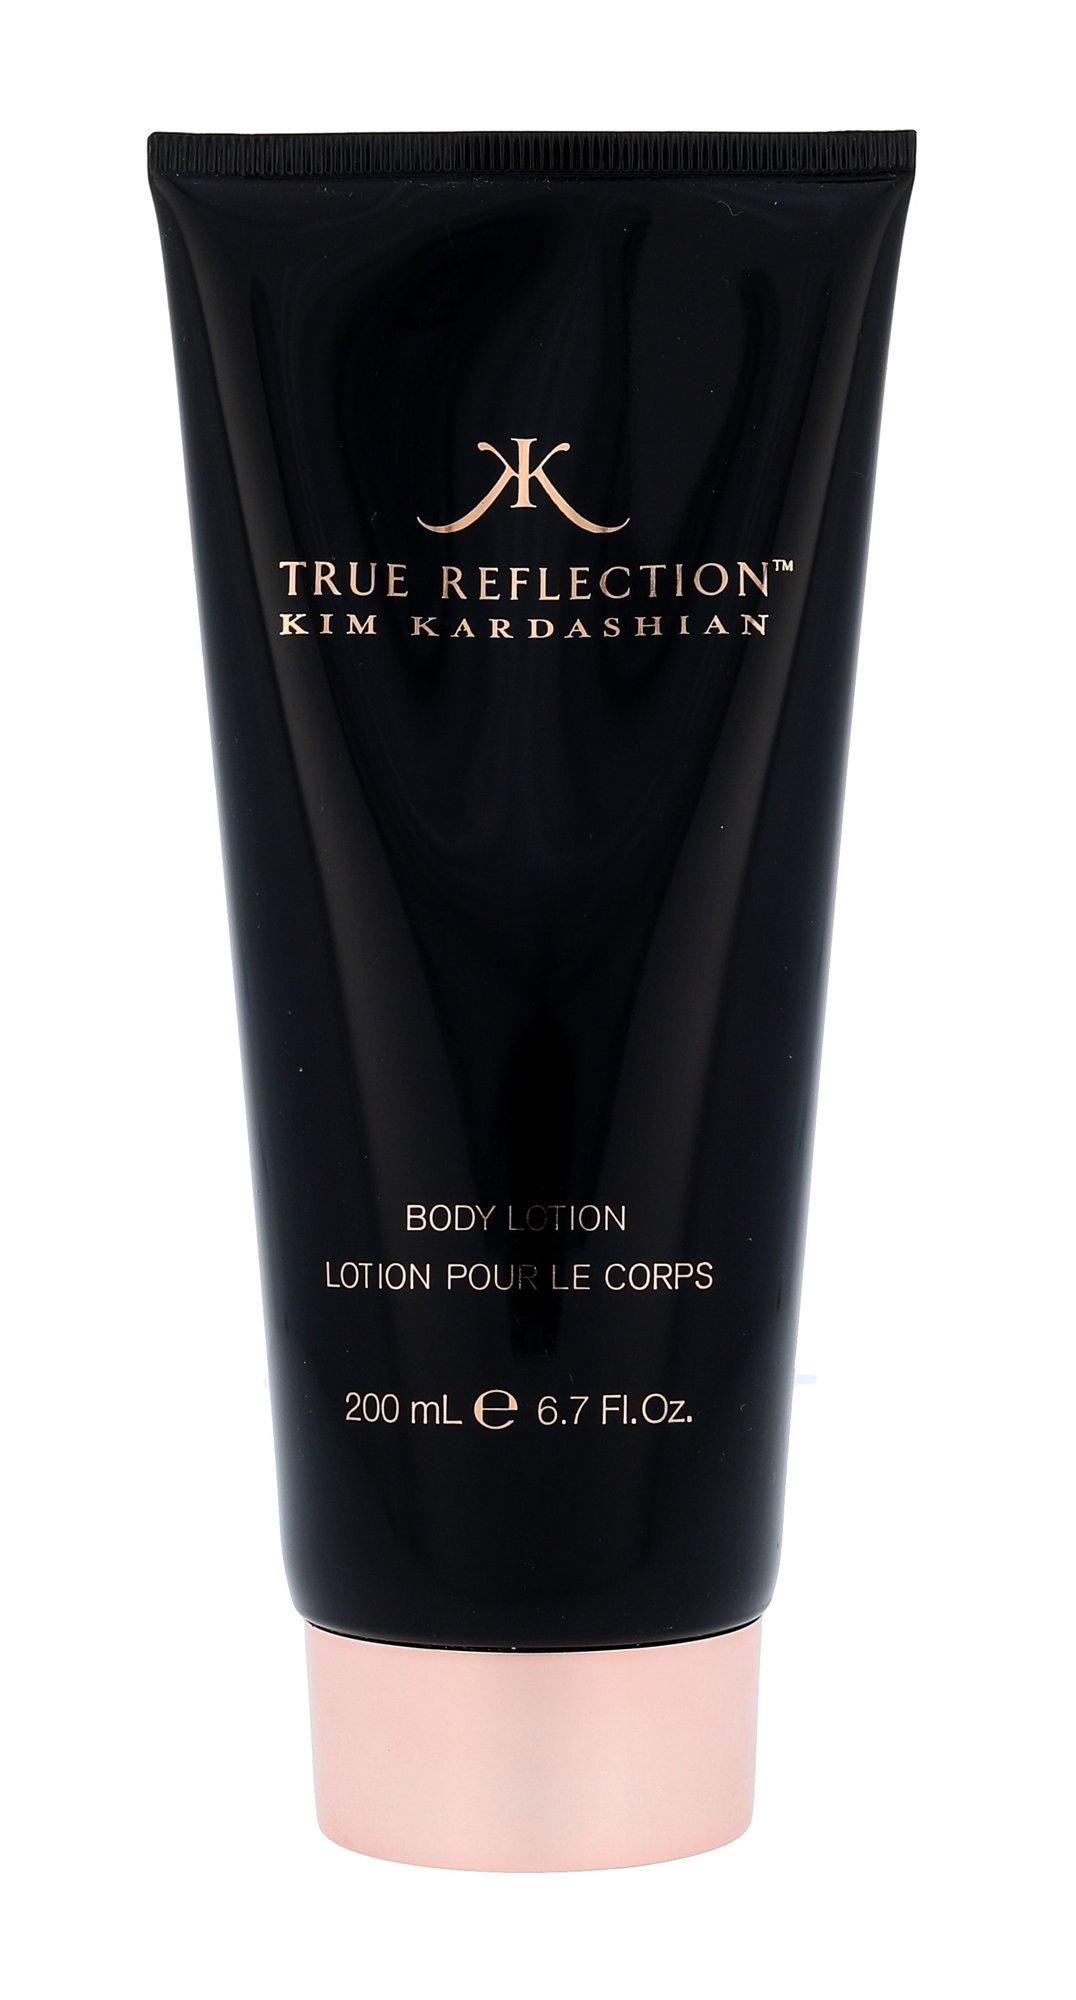 Kim Kardashian True Reflection Body lotion 200ml